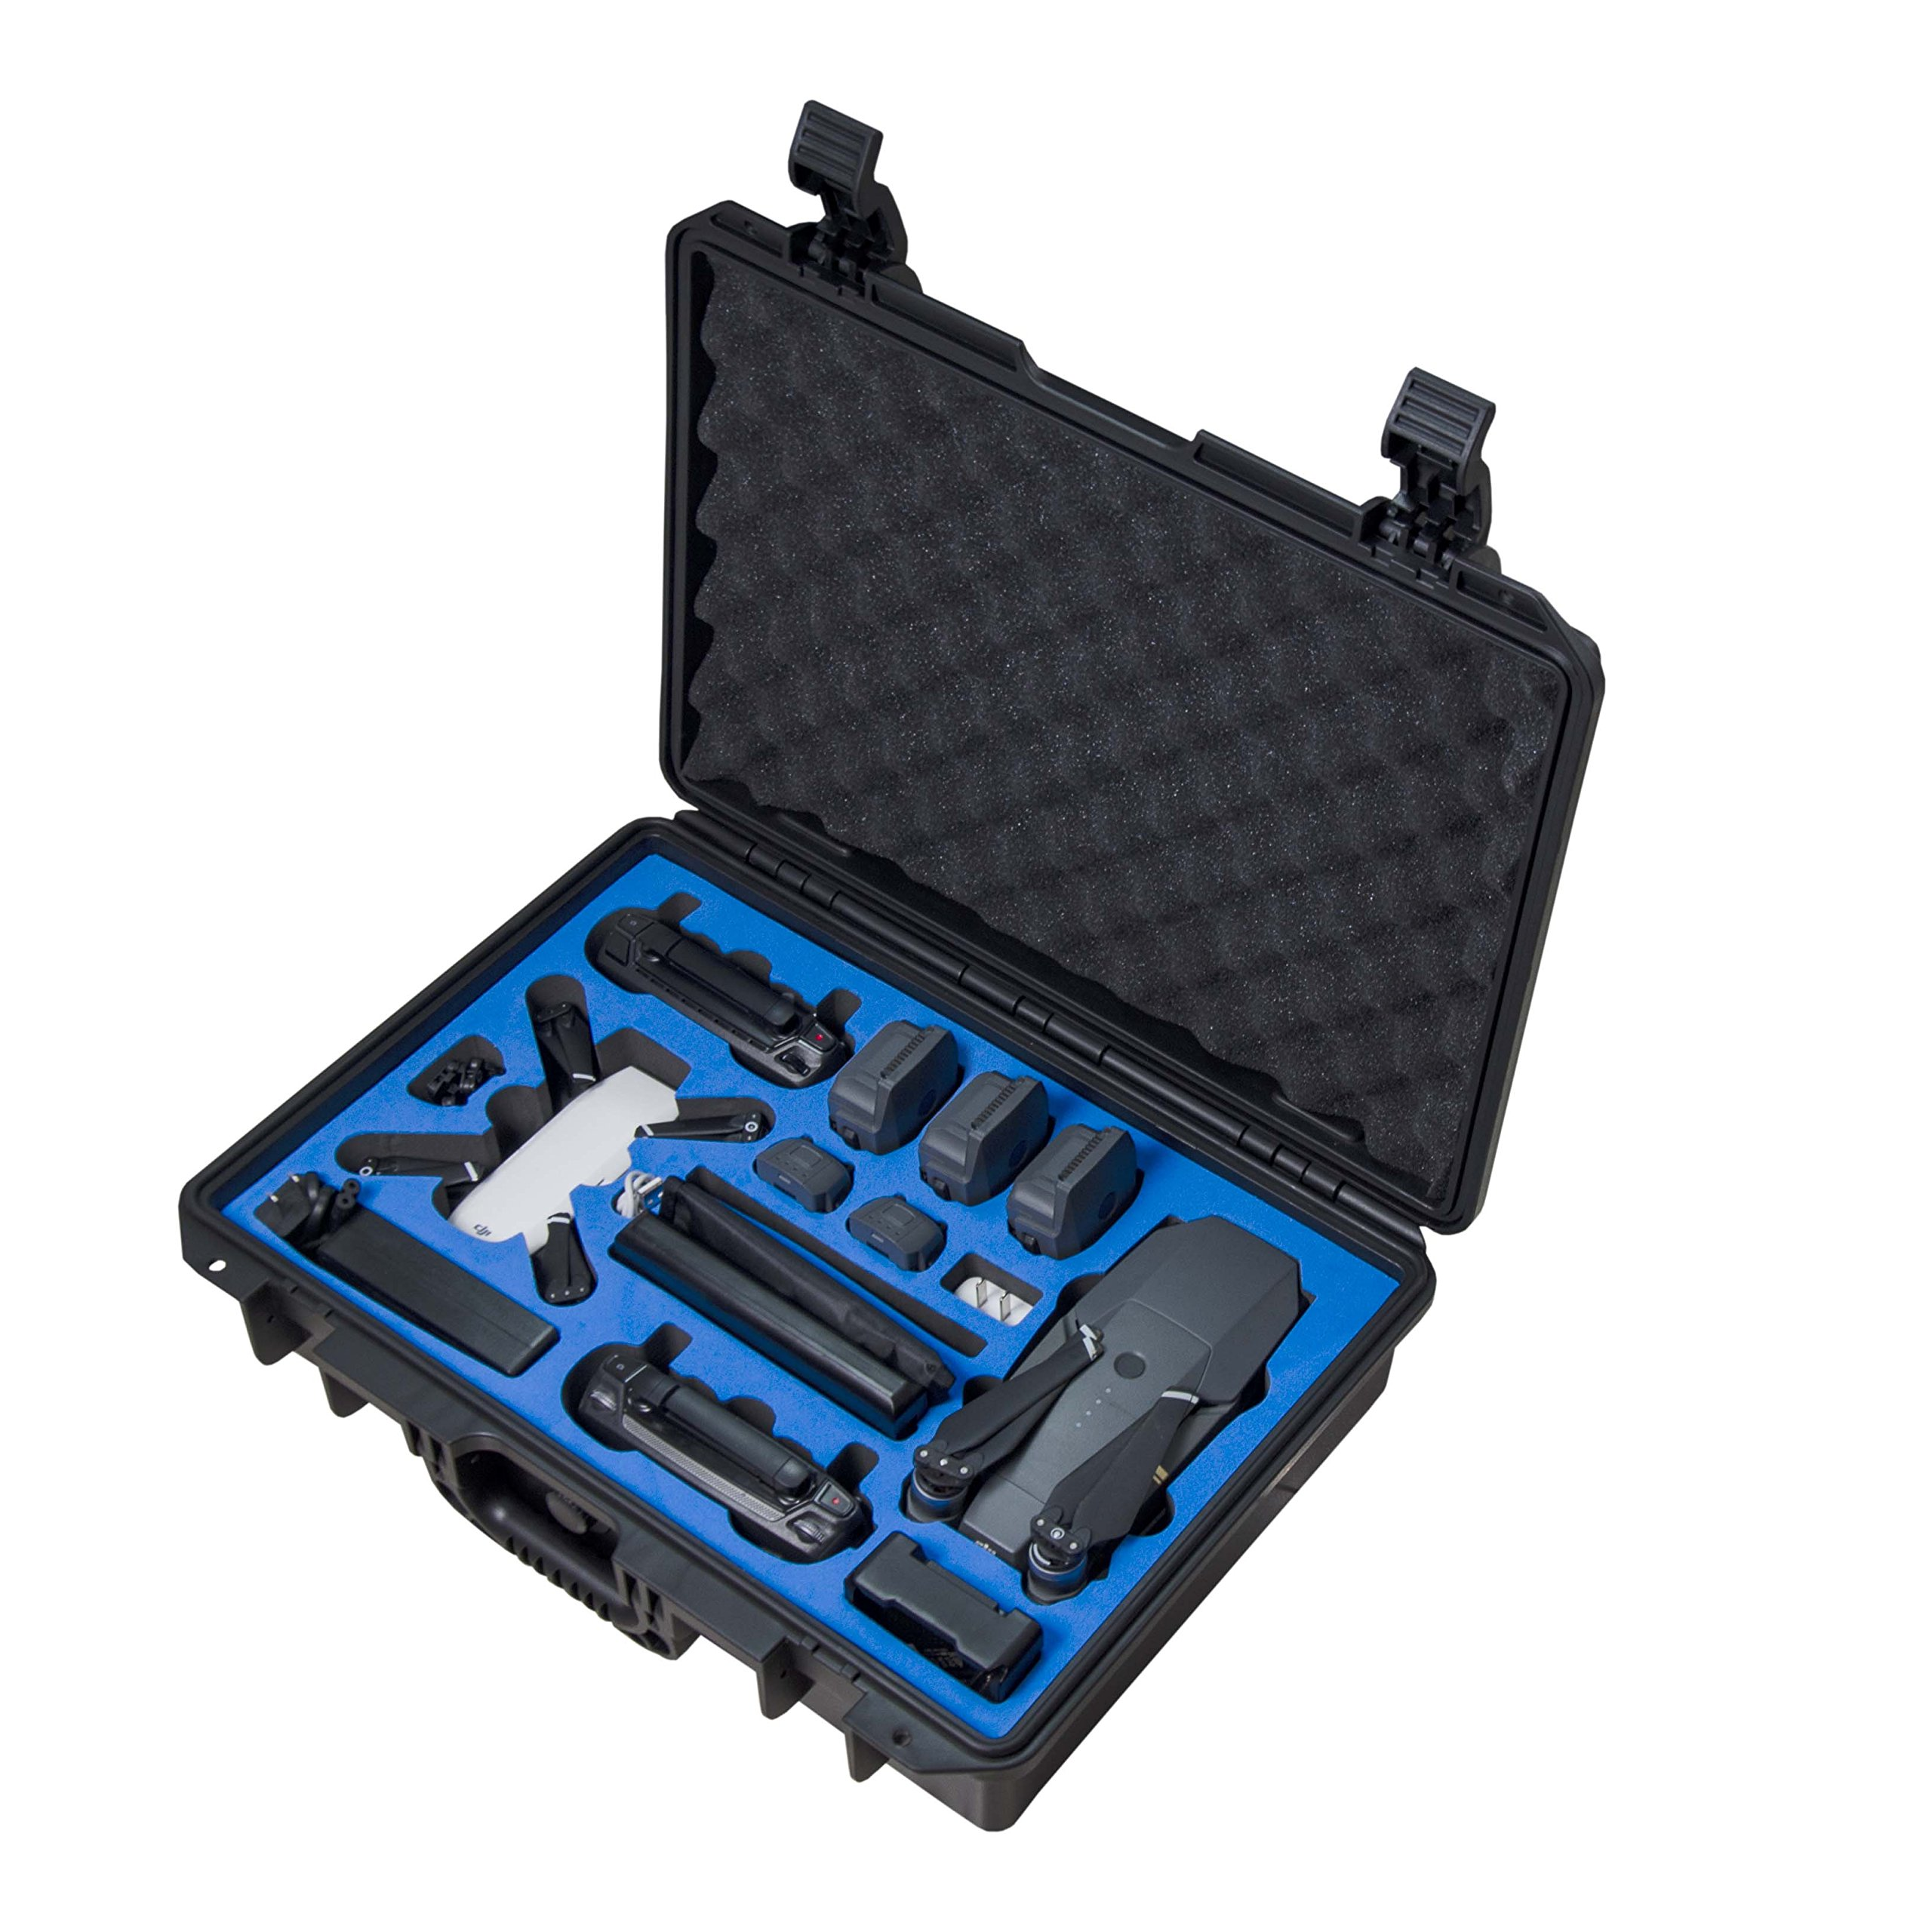 Freewell DJI Mavic & DJI Spark Waterproof Carry Case